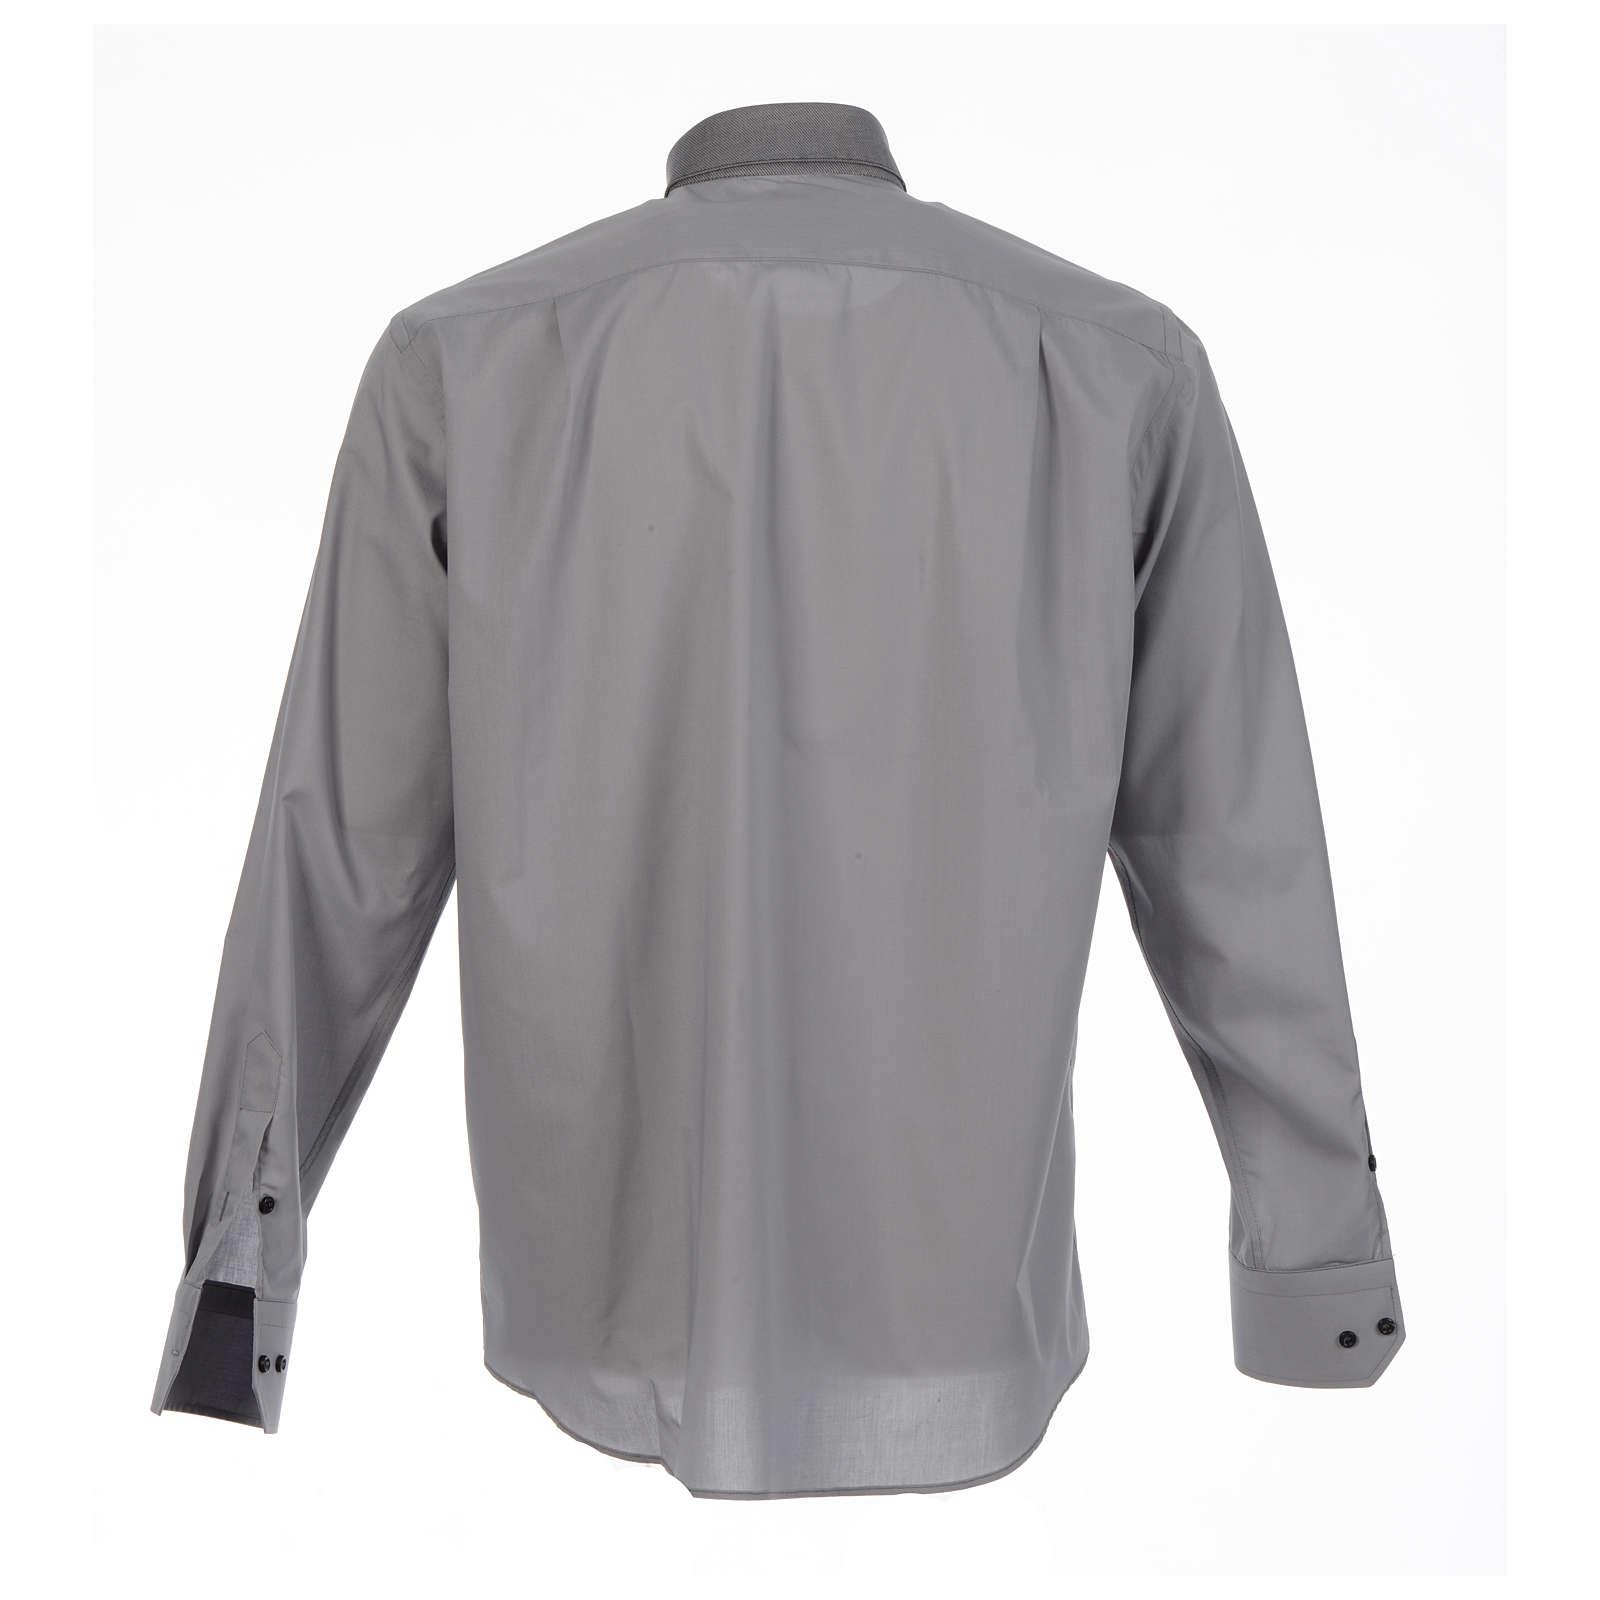 Camicia clergy tinta unita e diagonale grigio manica lunga 4